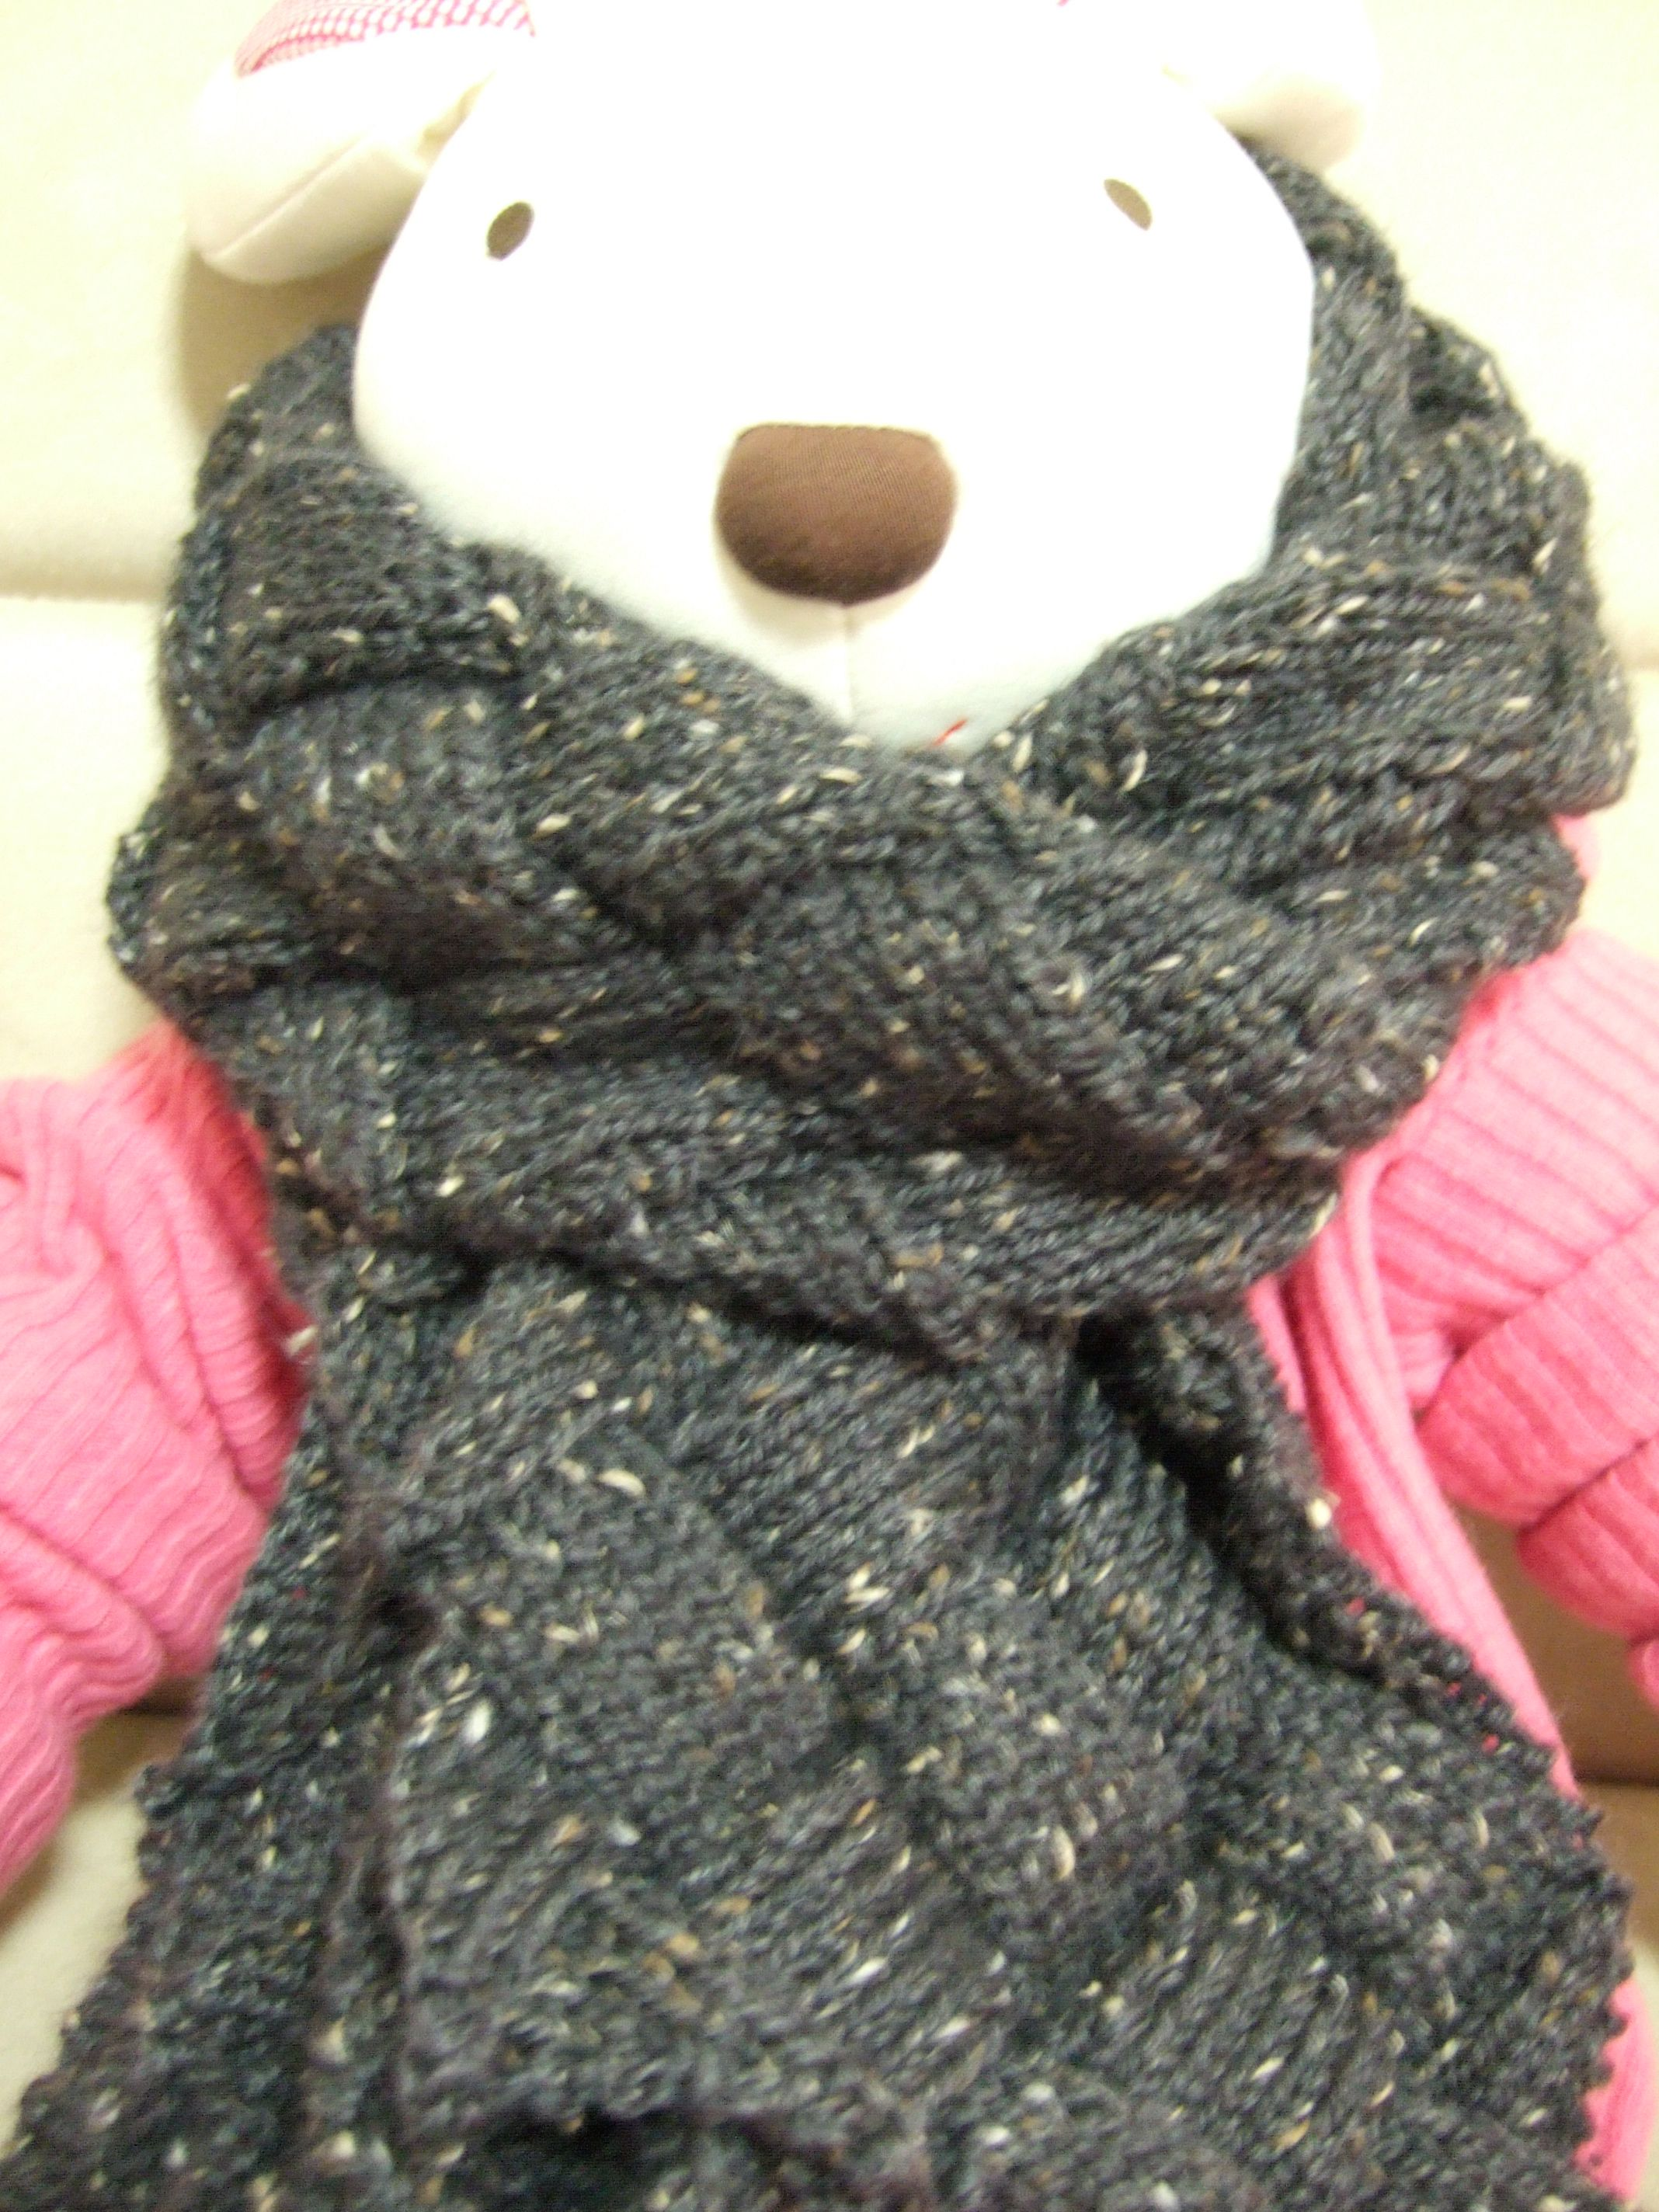 Entrelac scarf httpravelrypatternslibraryentrelac entrelac scarf httpravelrypatternslibrary bankloansurffo Gallery